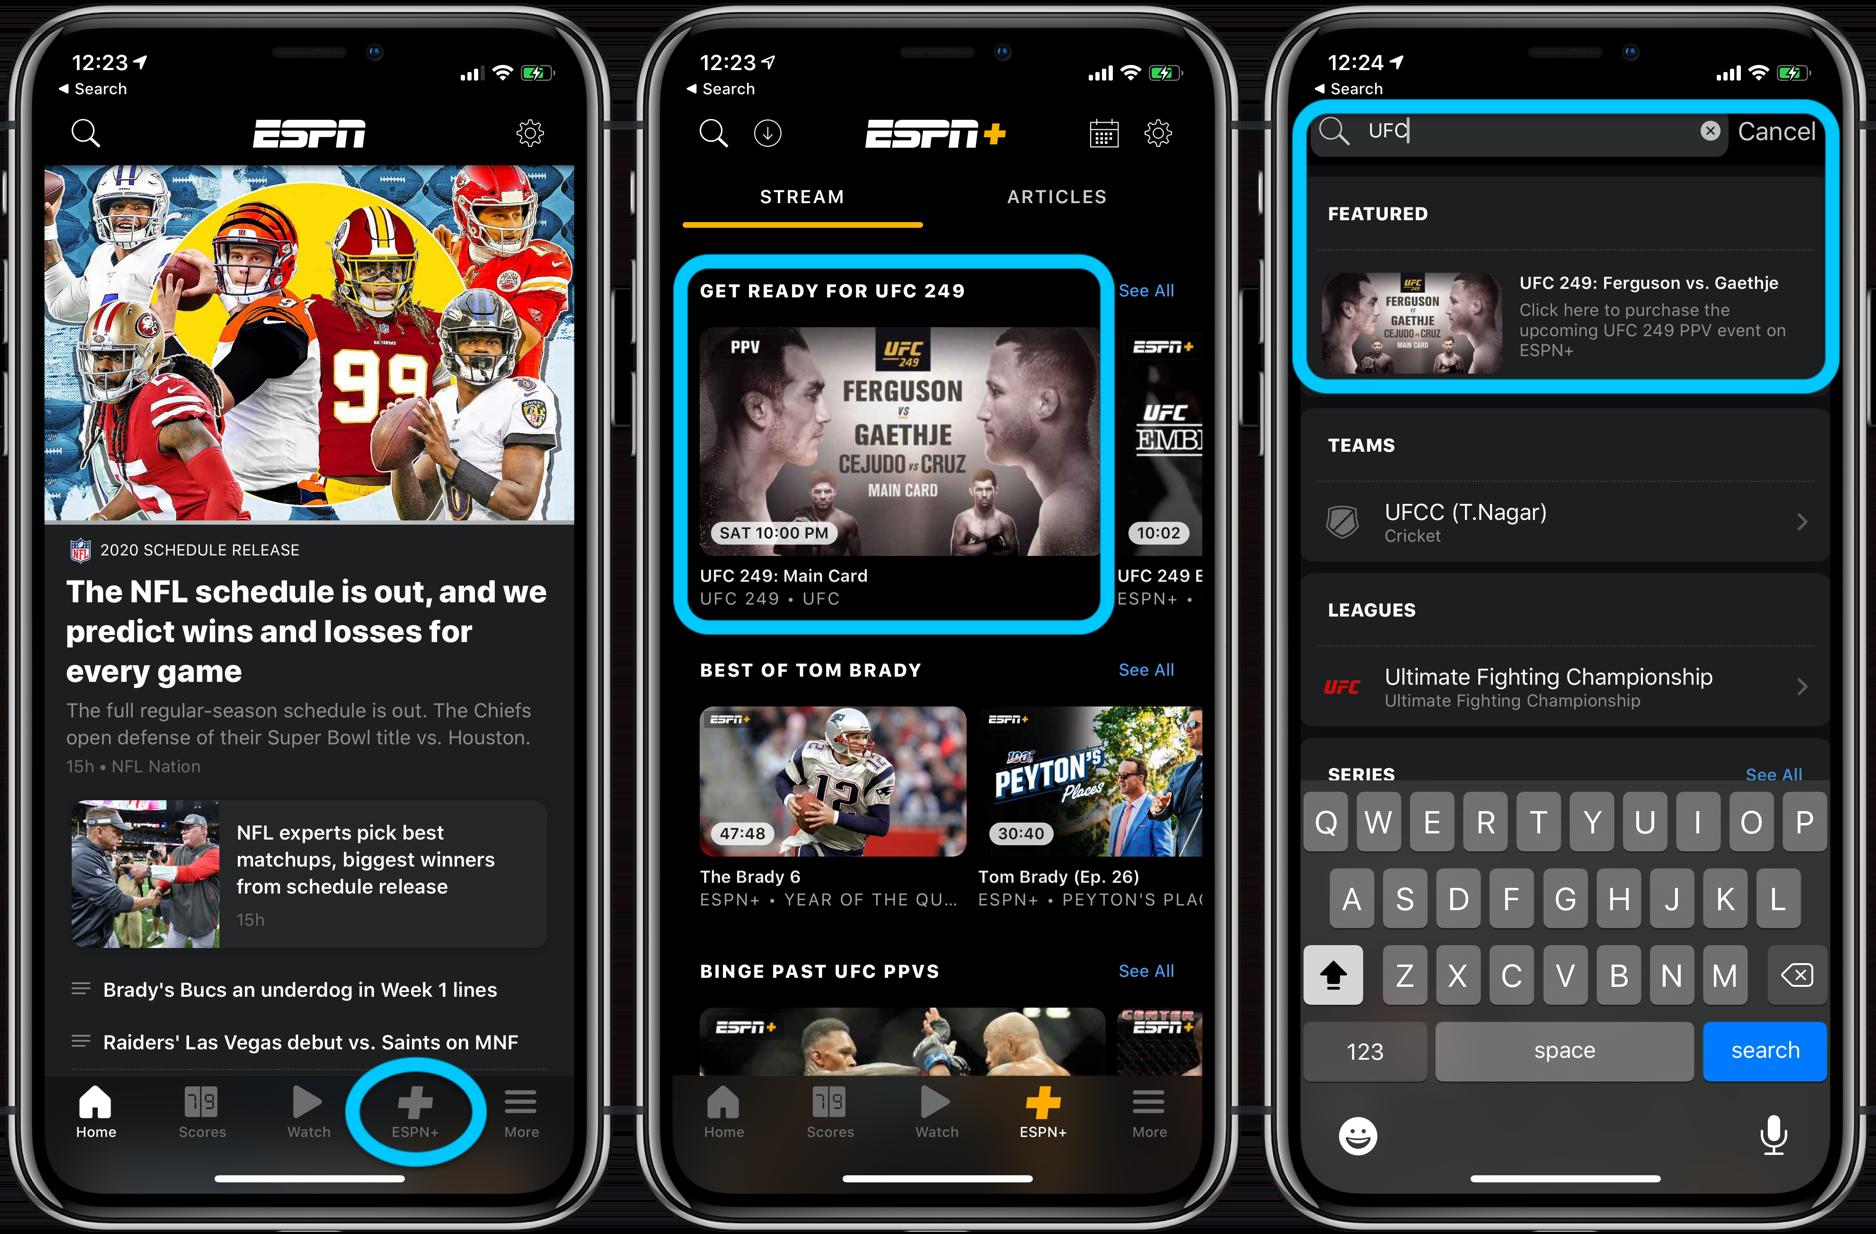 How to watch UFC 249 Ferguson Gaethje iPhone, iPad, Apple TV walkthrough